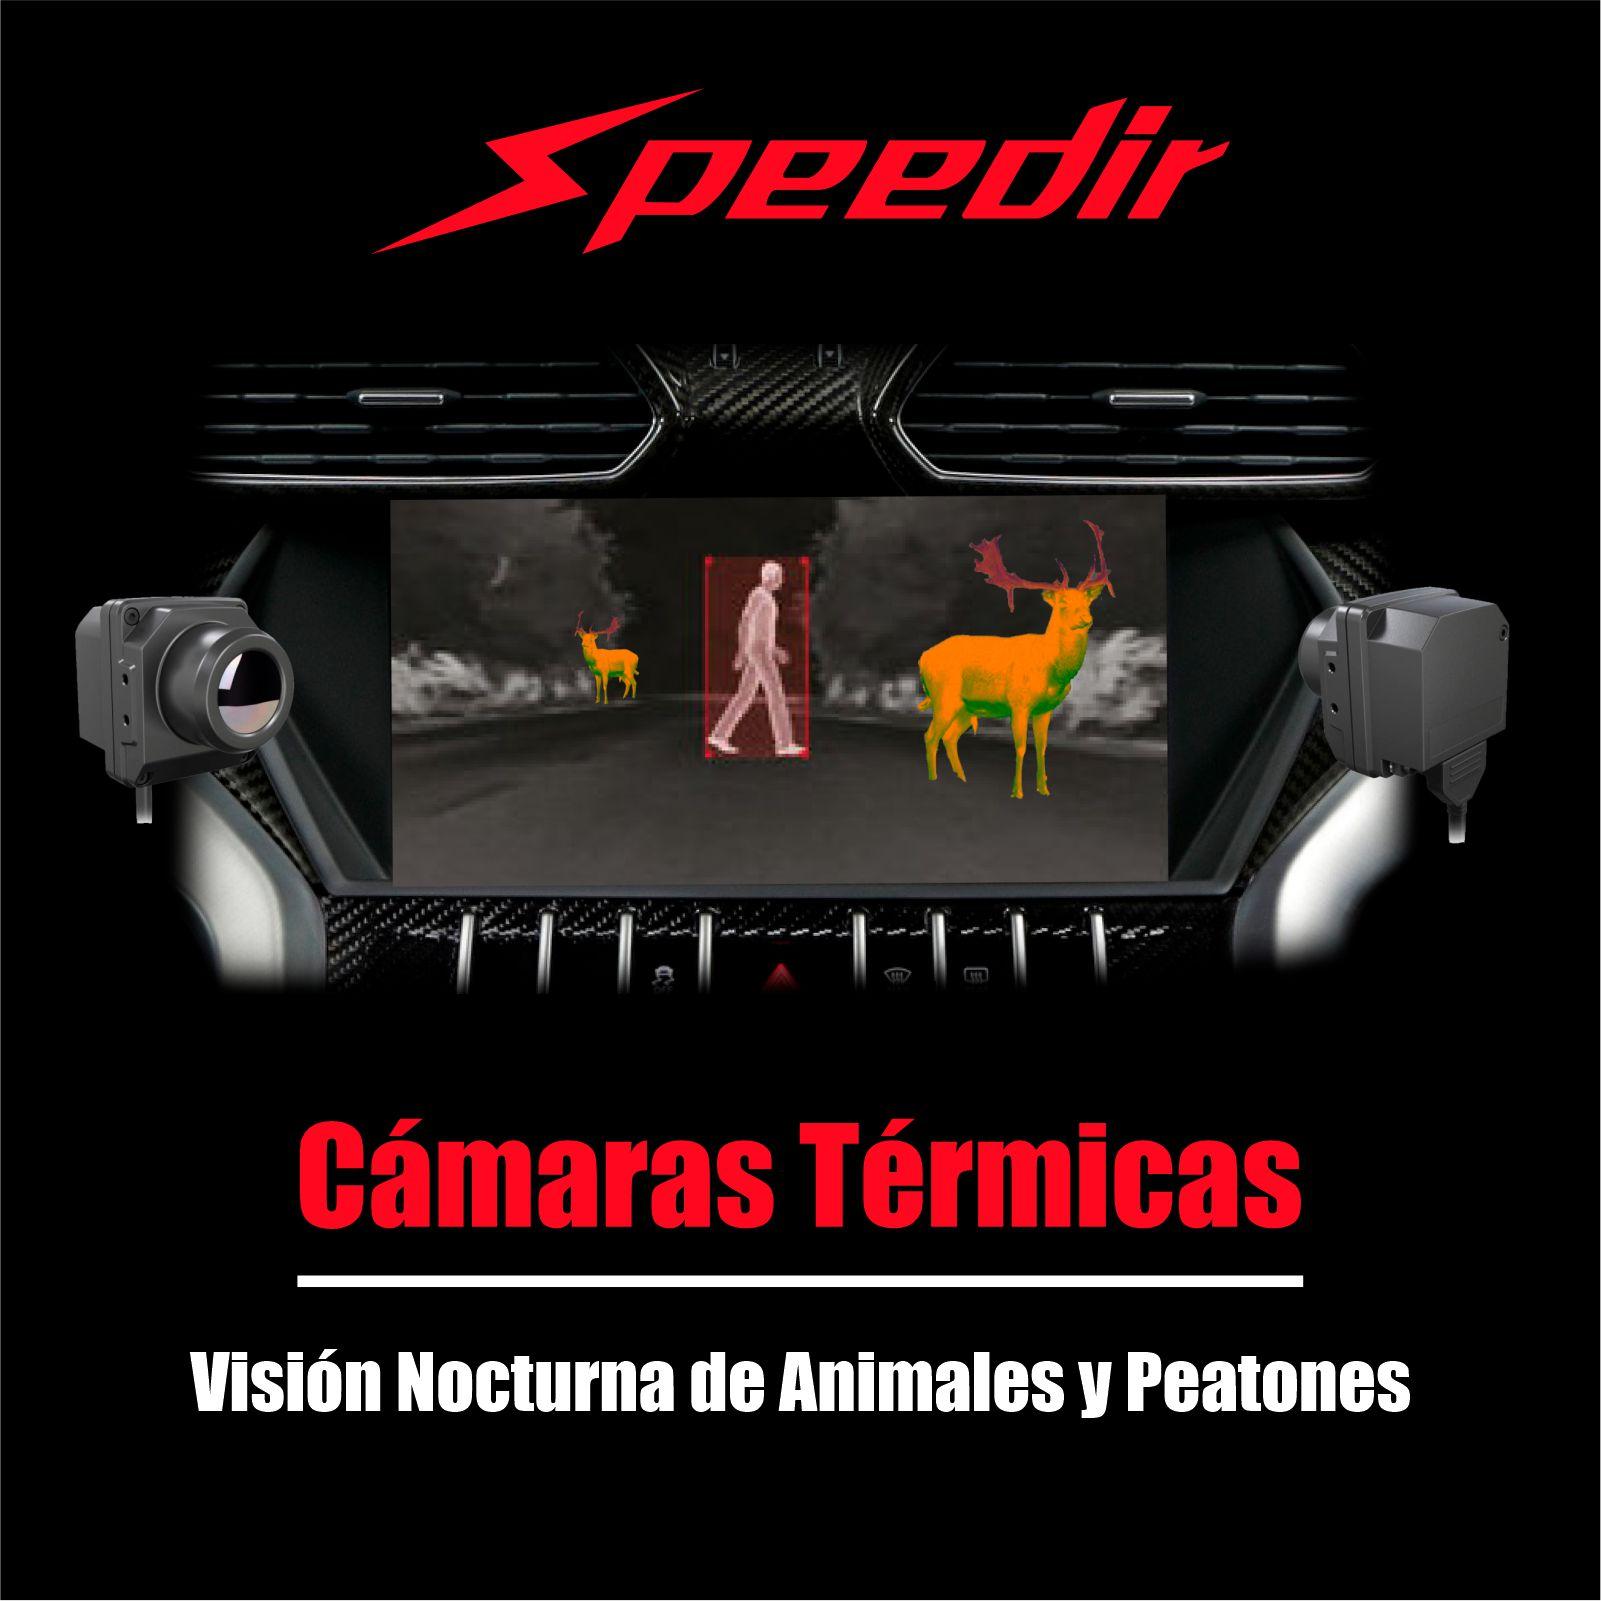 SPEEDIR cámara visión nocturna